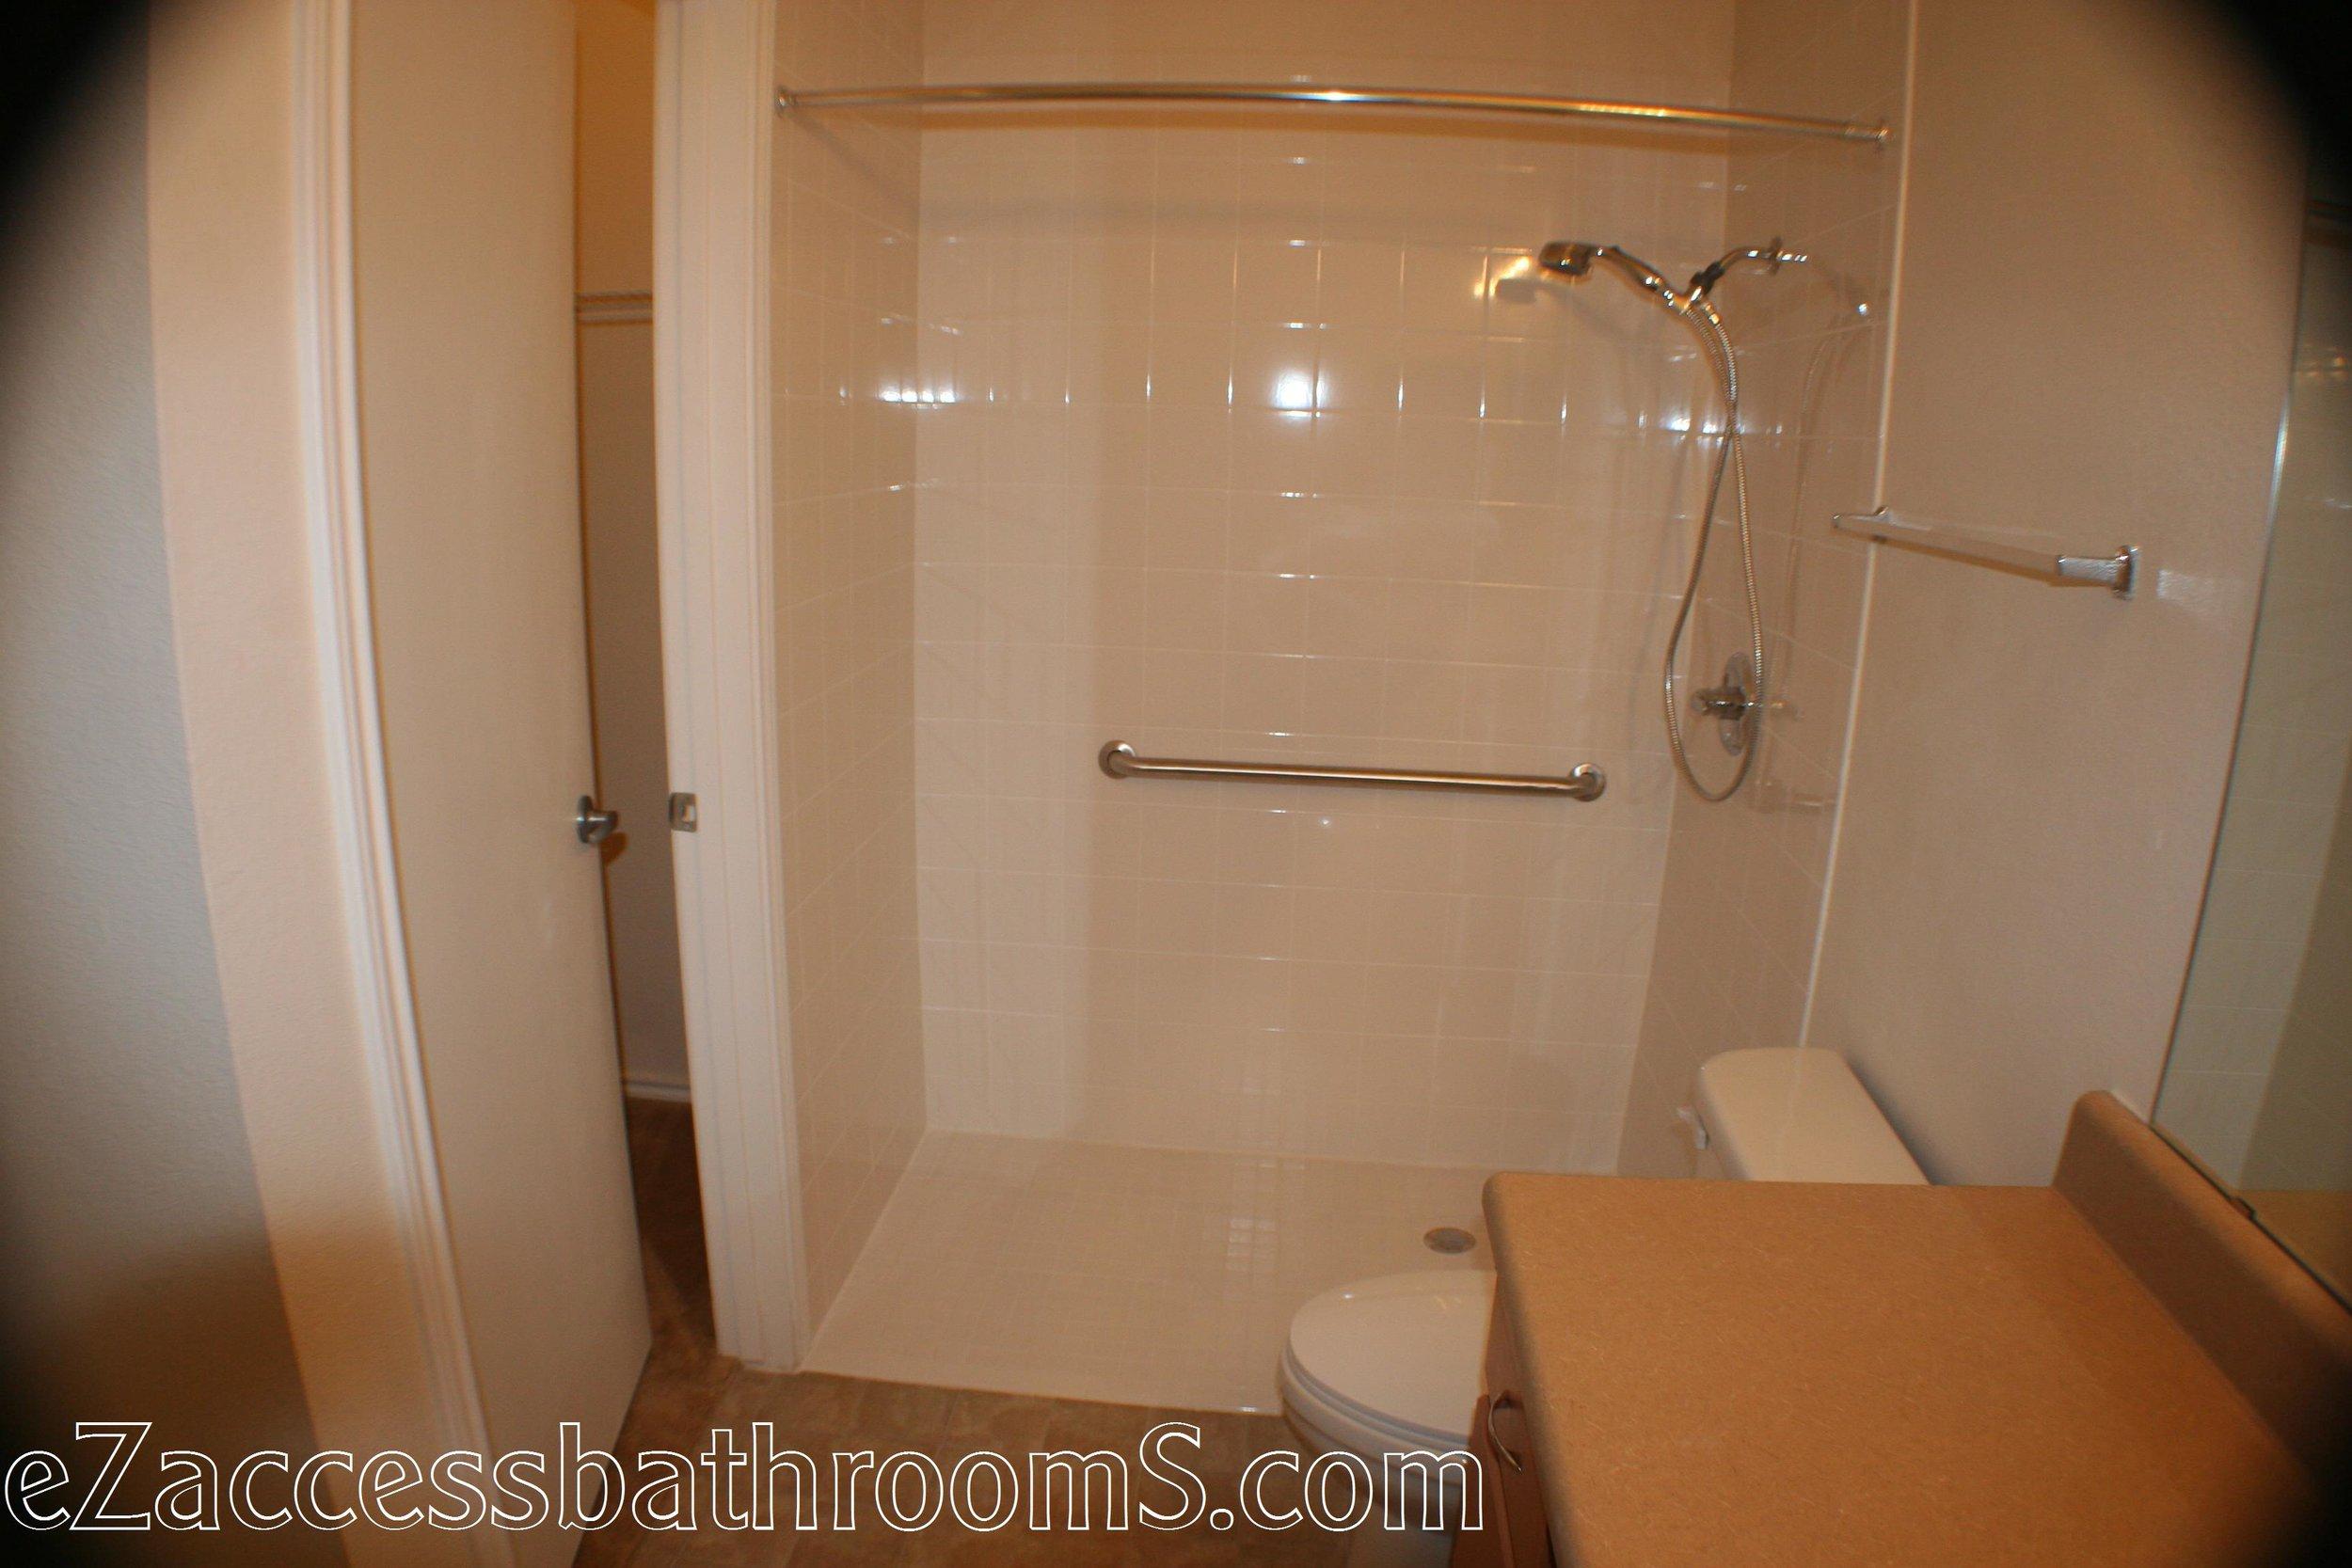 cheap tub to shower conversion ezaccessbathrooms.com 023.JPG